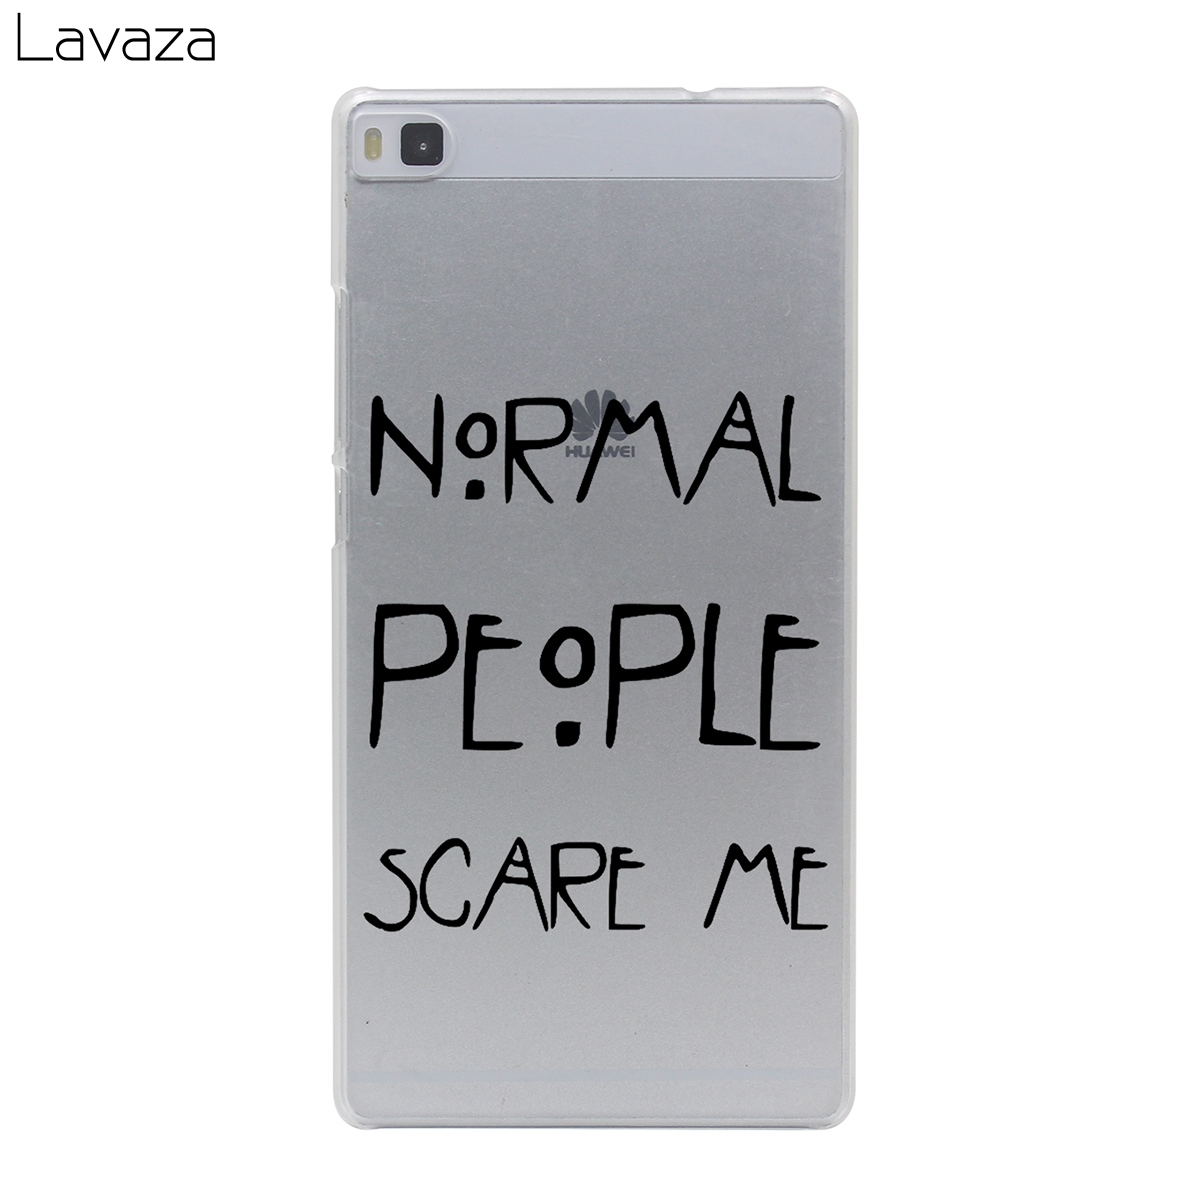 Lavaza Эван Питерс чехол для Huawei Коврики P9 P8 P10 P20 10 9 lite плюс Pro Mini 2017 P smart